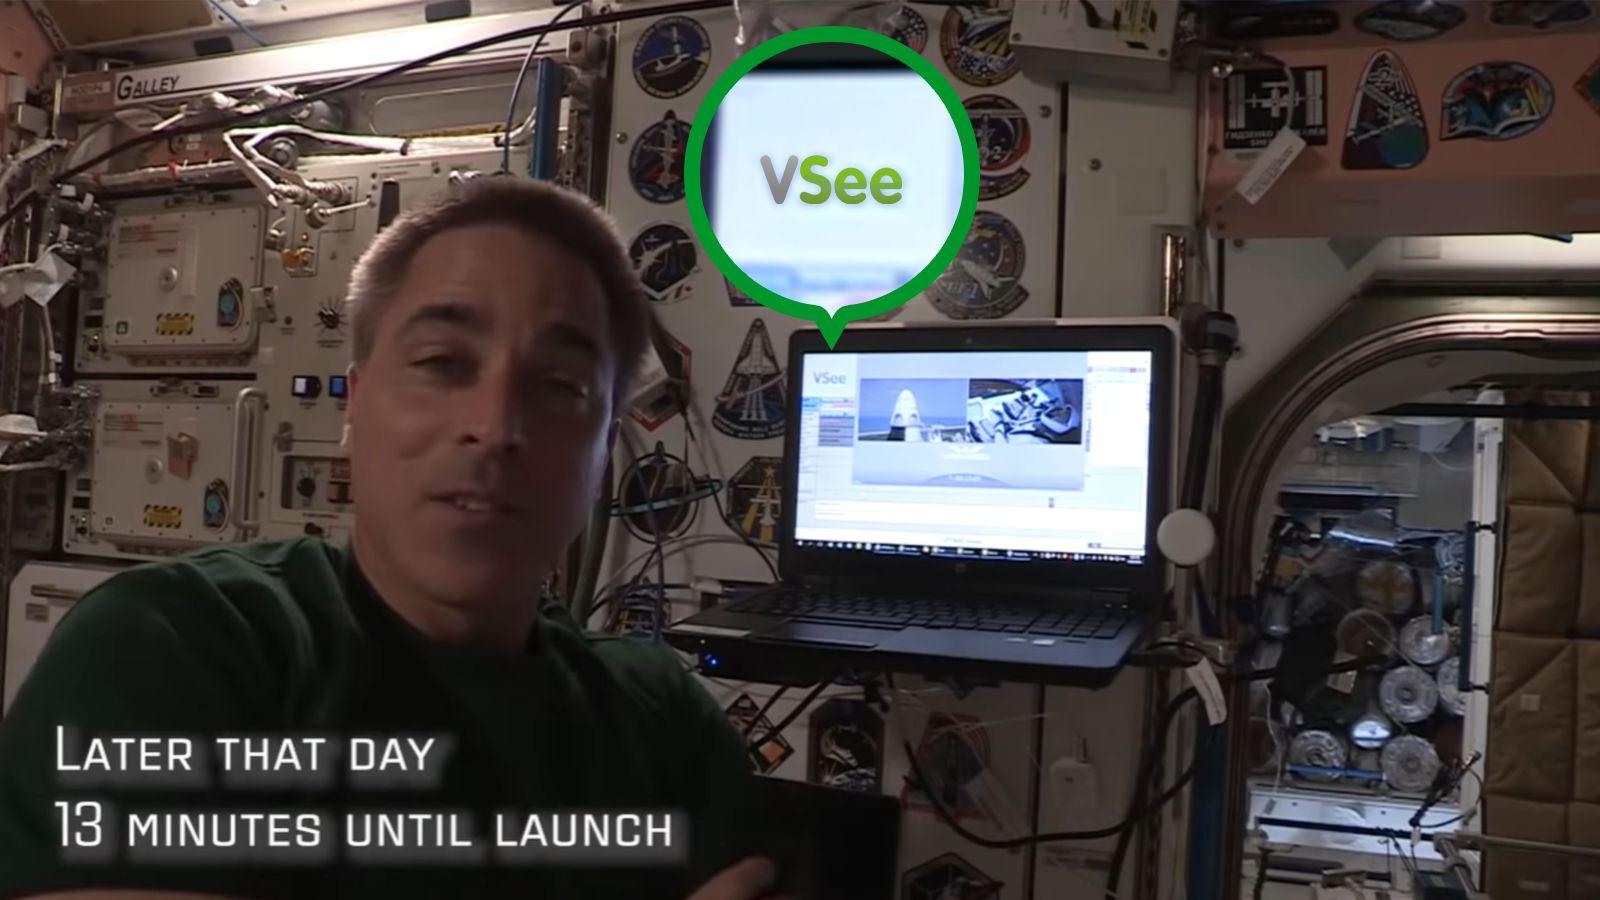 VSee for NASA SpaceX docking